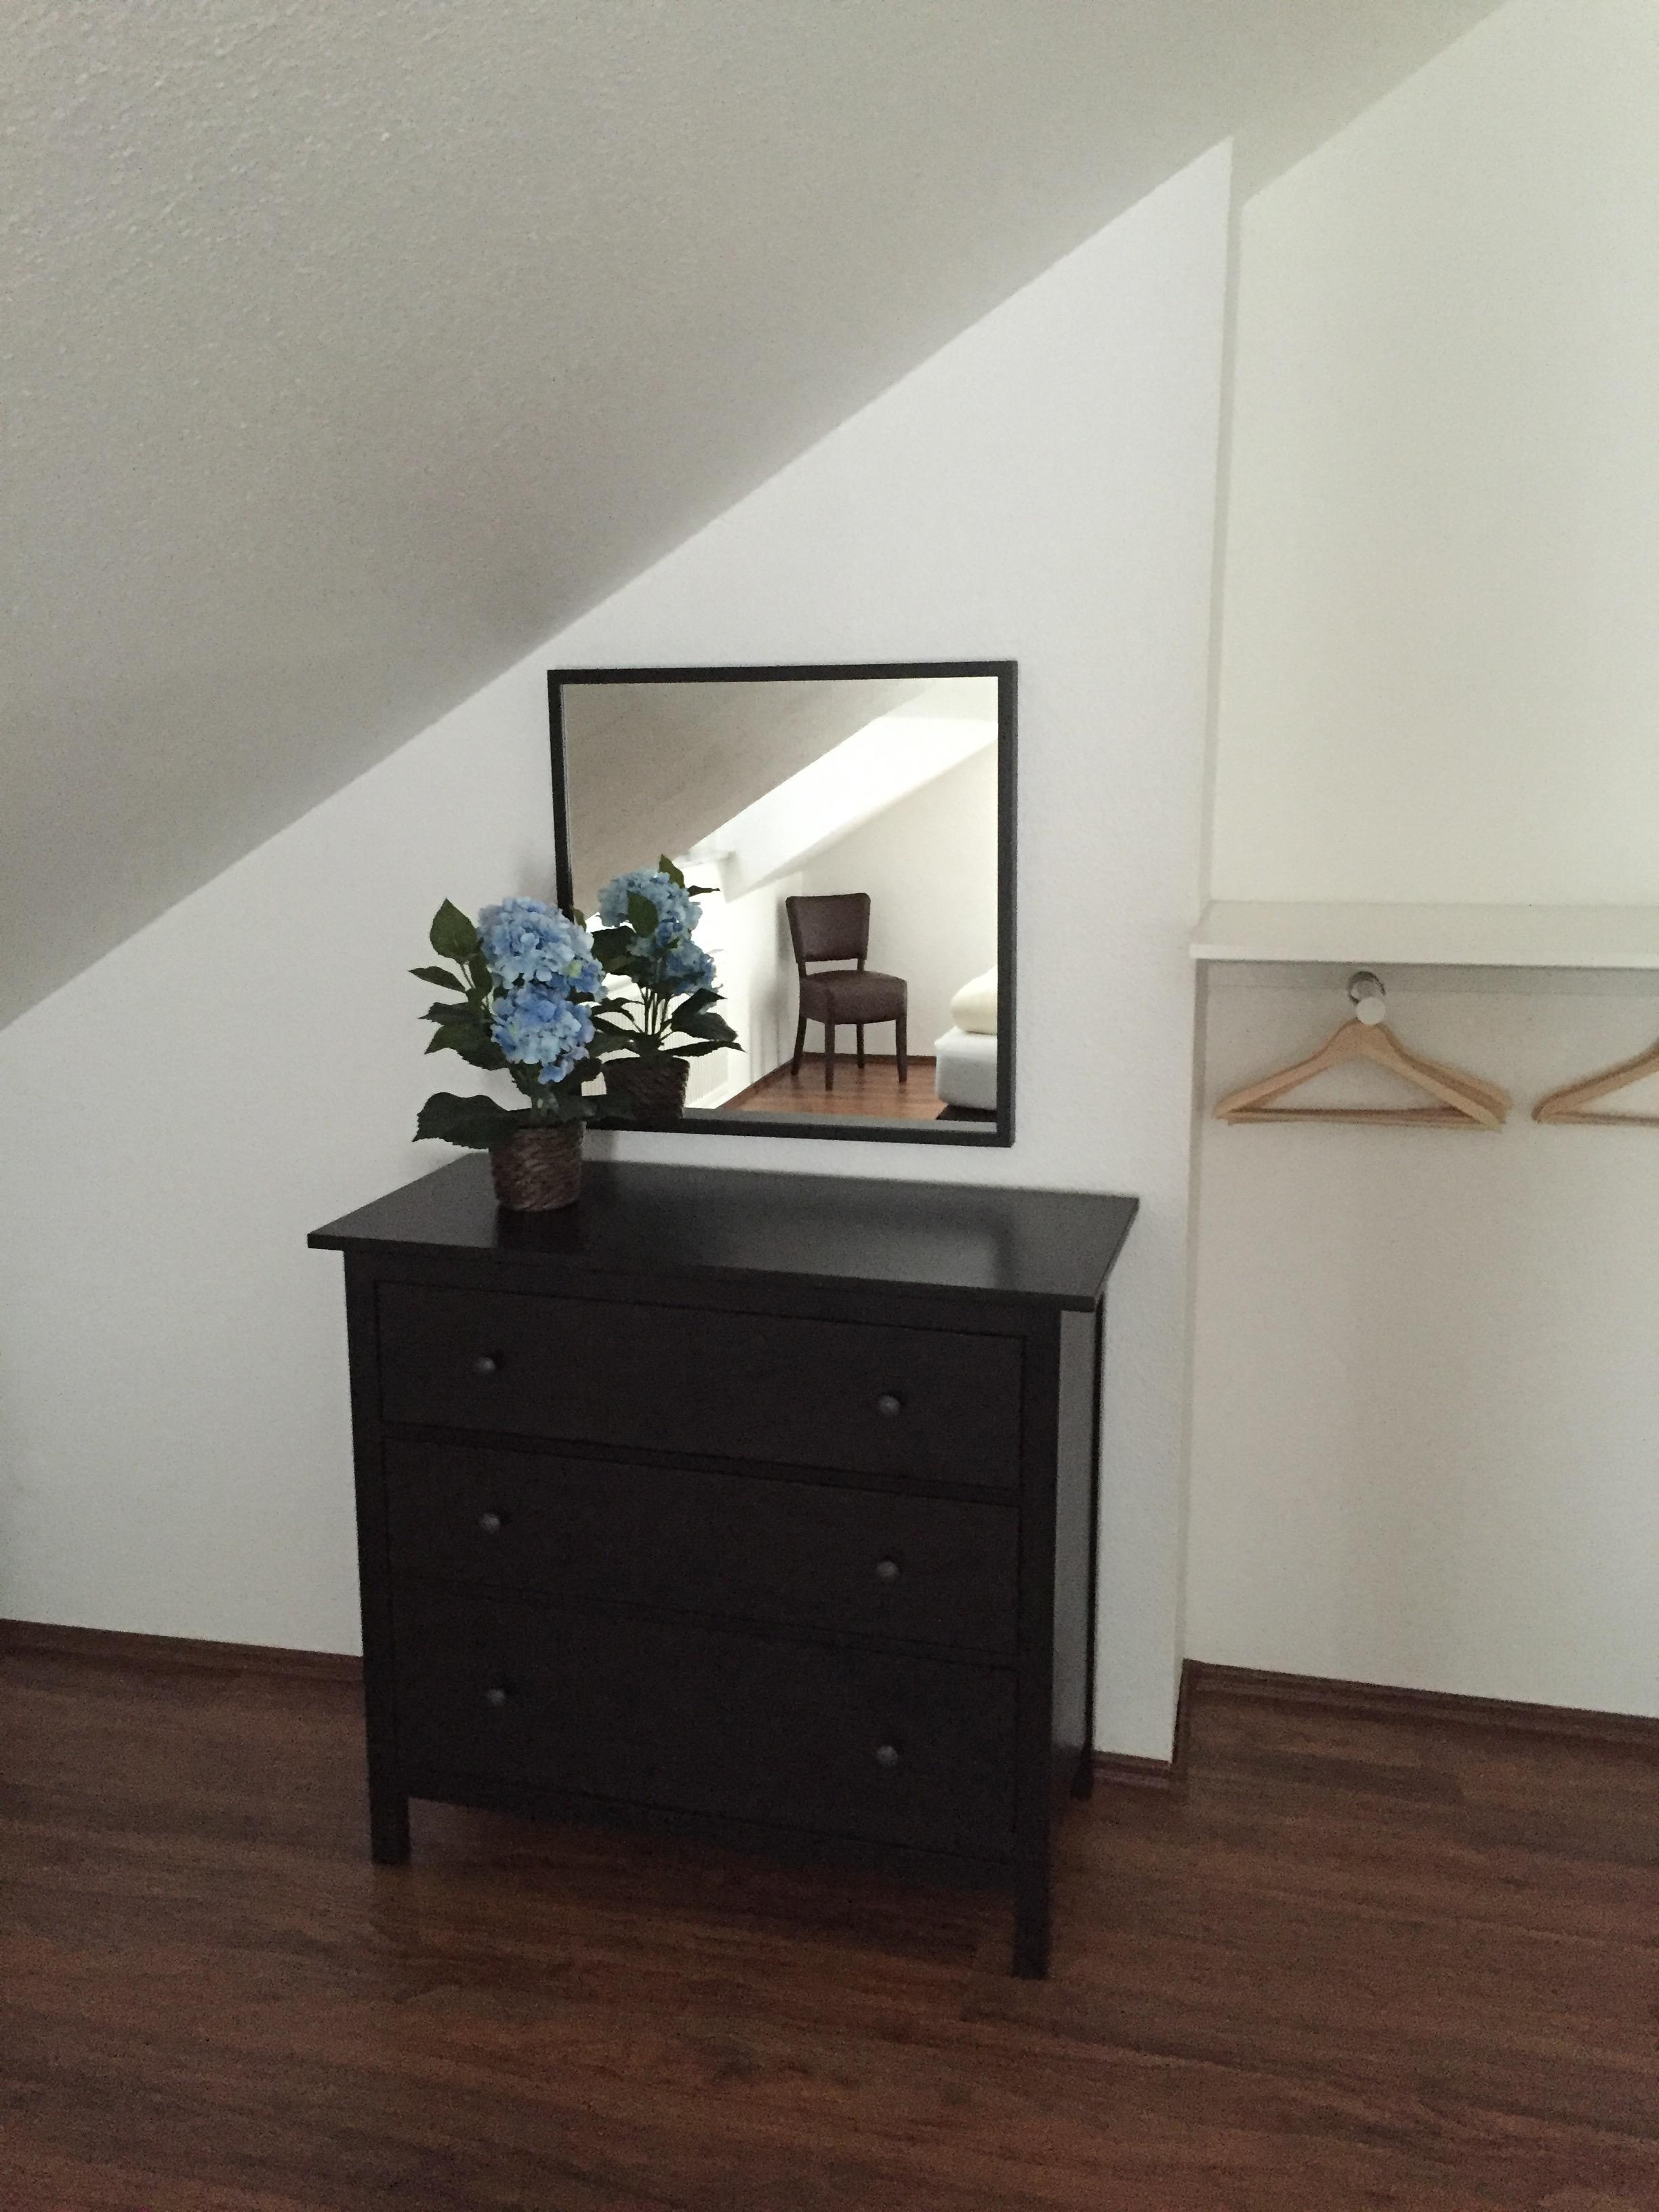 wincent suite wincent hotel sinsheim. Black Bedroom Furniture Sets. Home Design Ideas